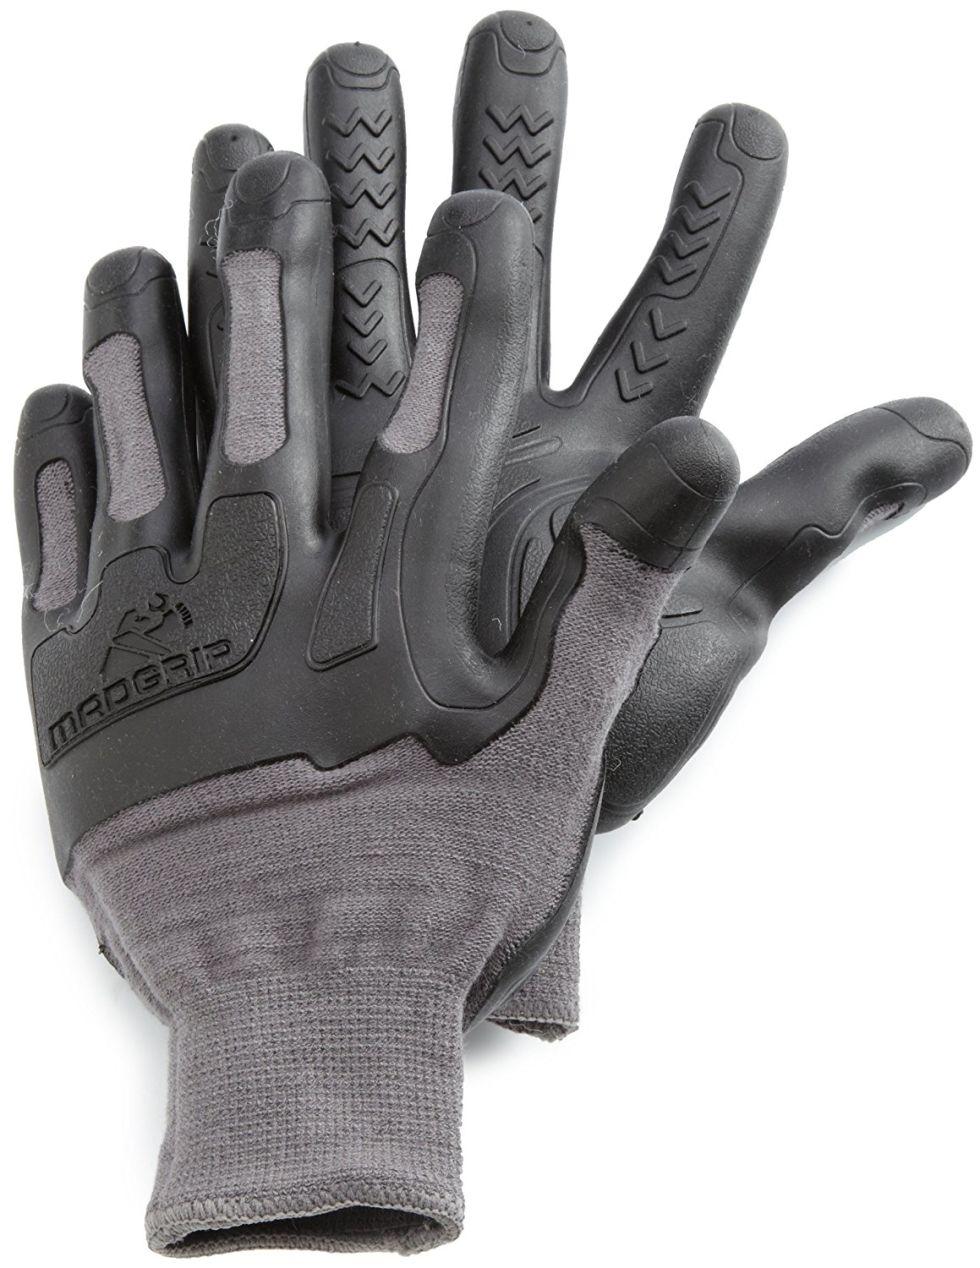 Black gardening gloves - 11 Best Gardening Gloves In 2017 Reviews Of Rubber And Leather Gardening Gloves